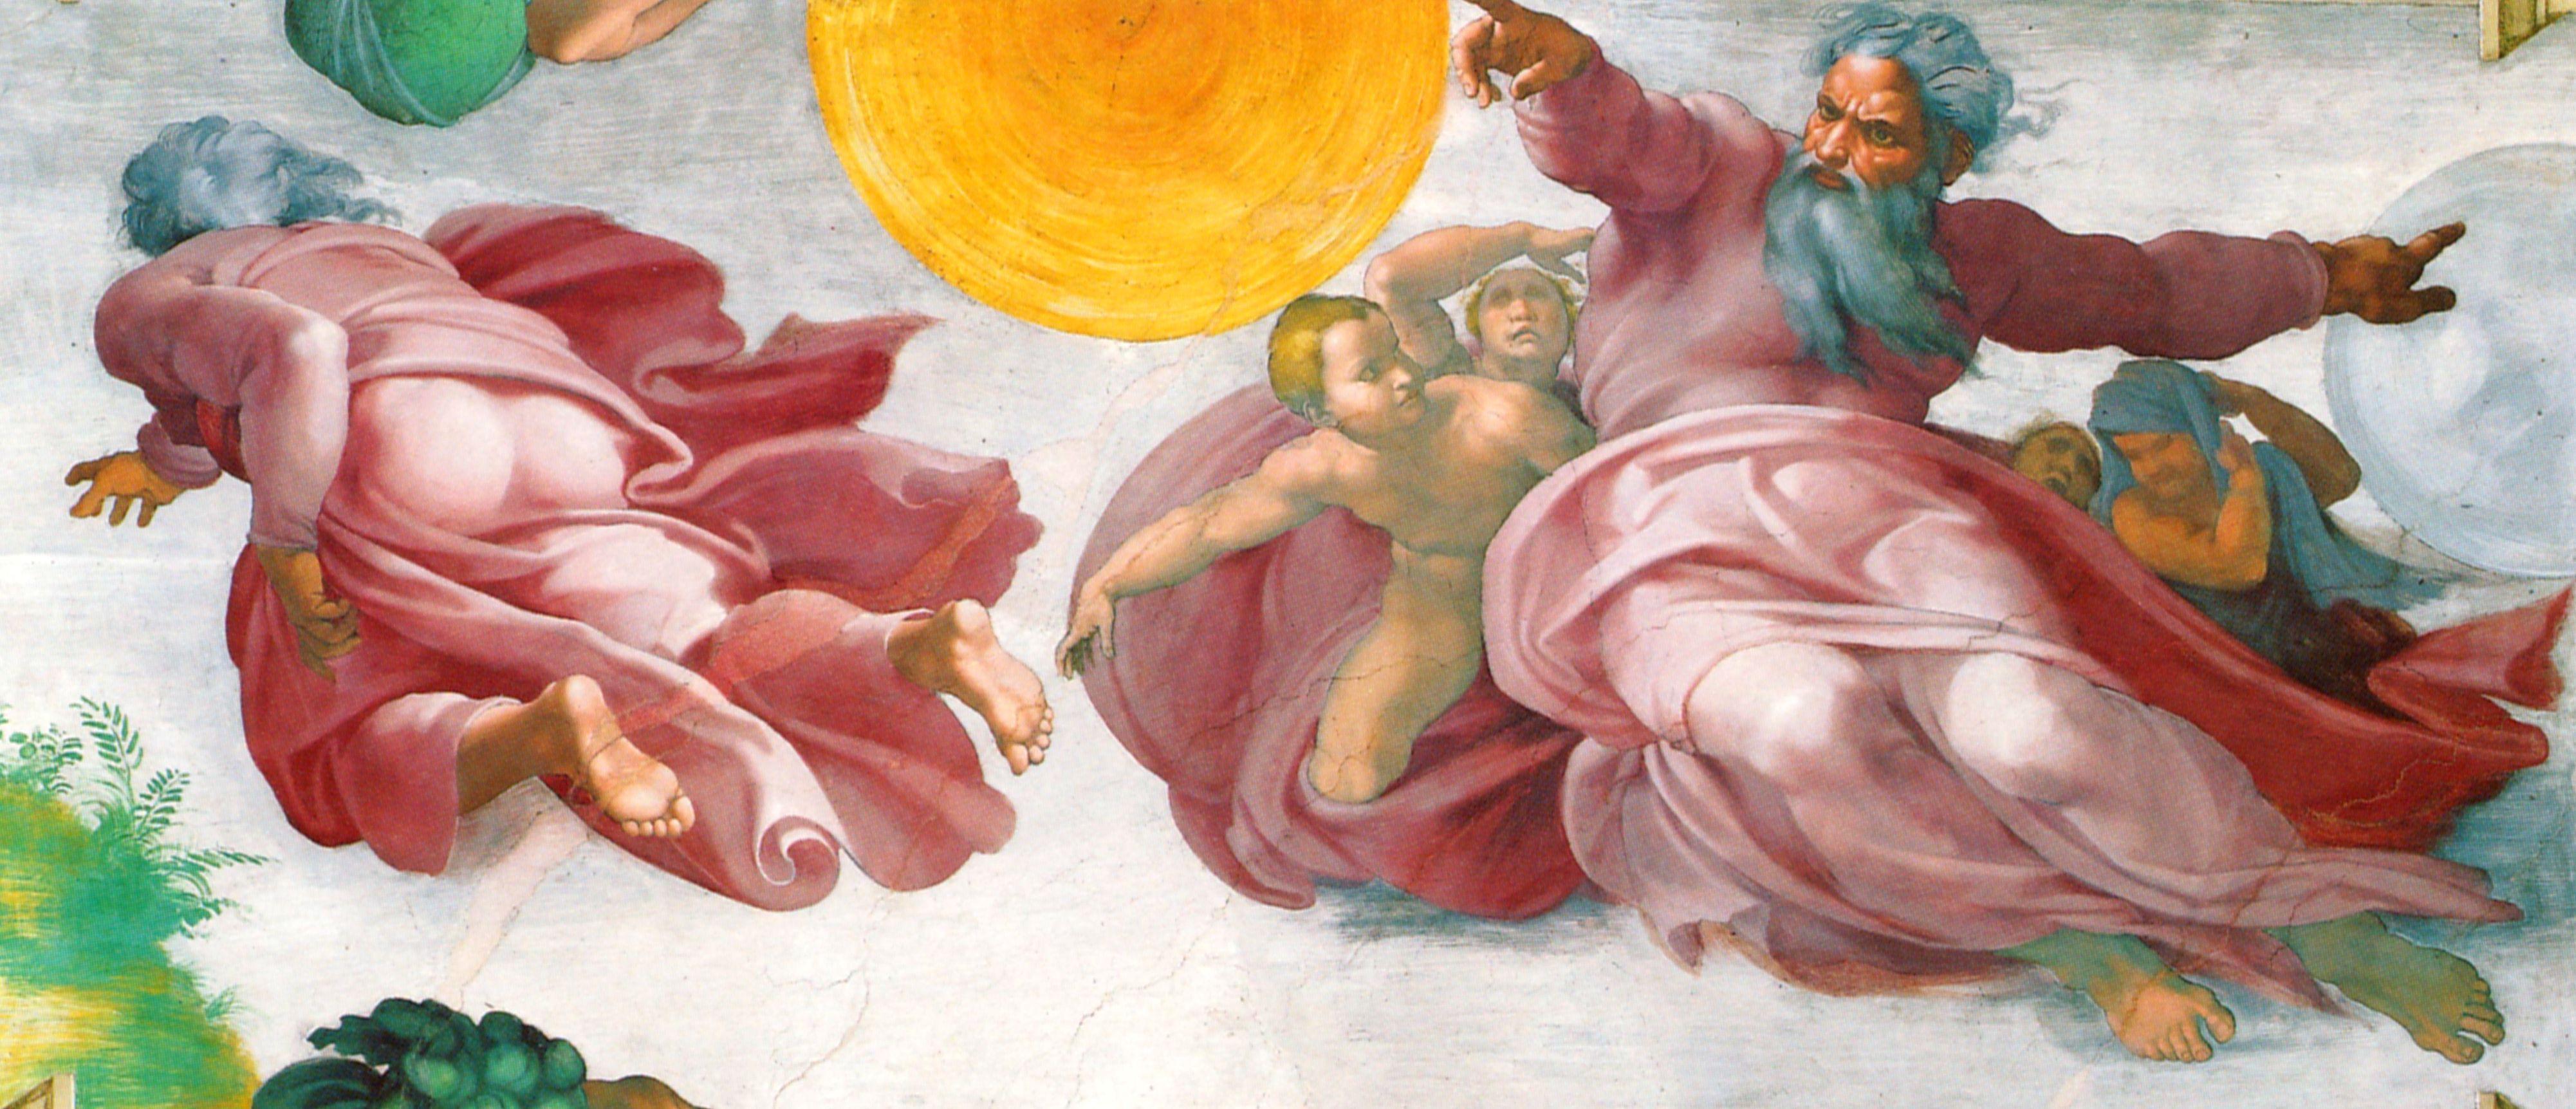 All sizes  Sixtinische Kapelle Michelangelo Erschaffung der